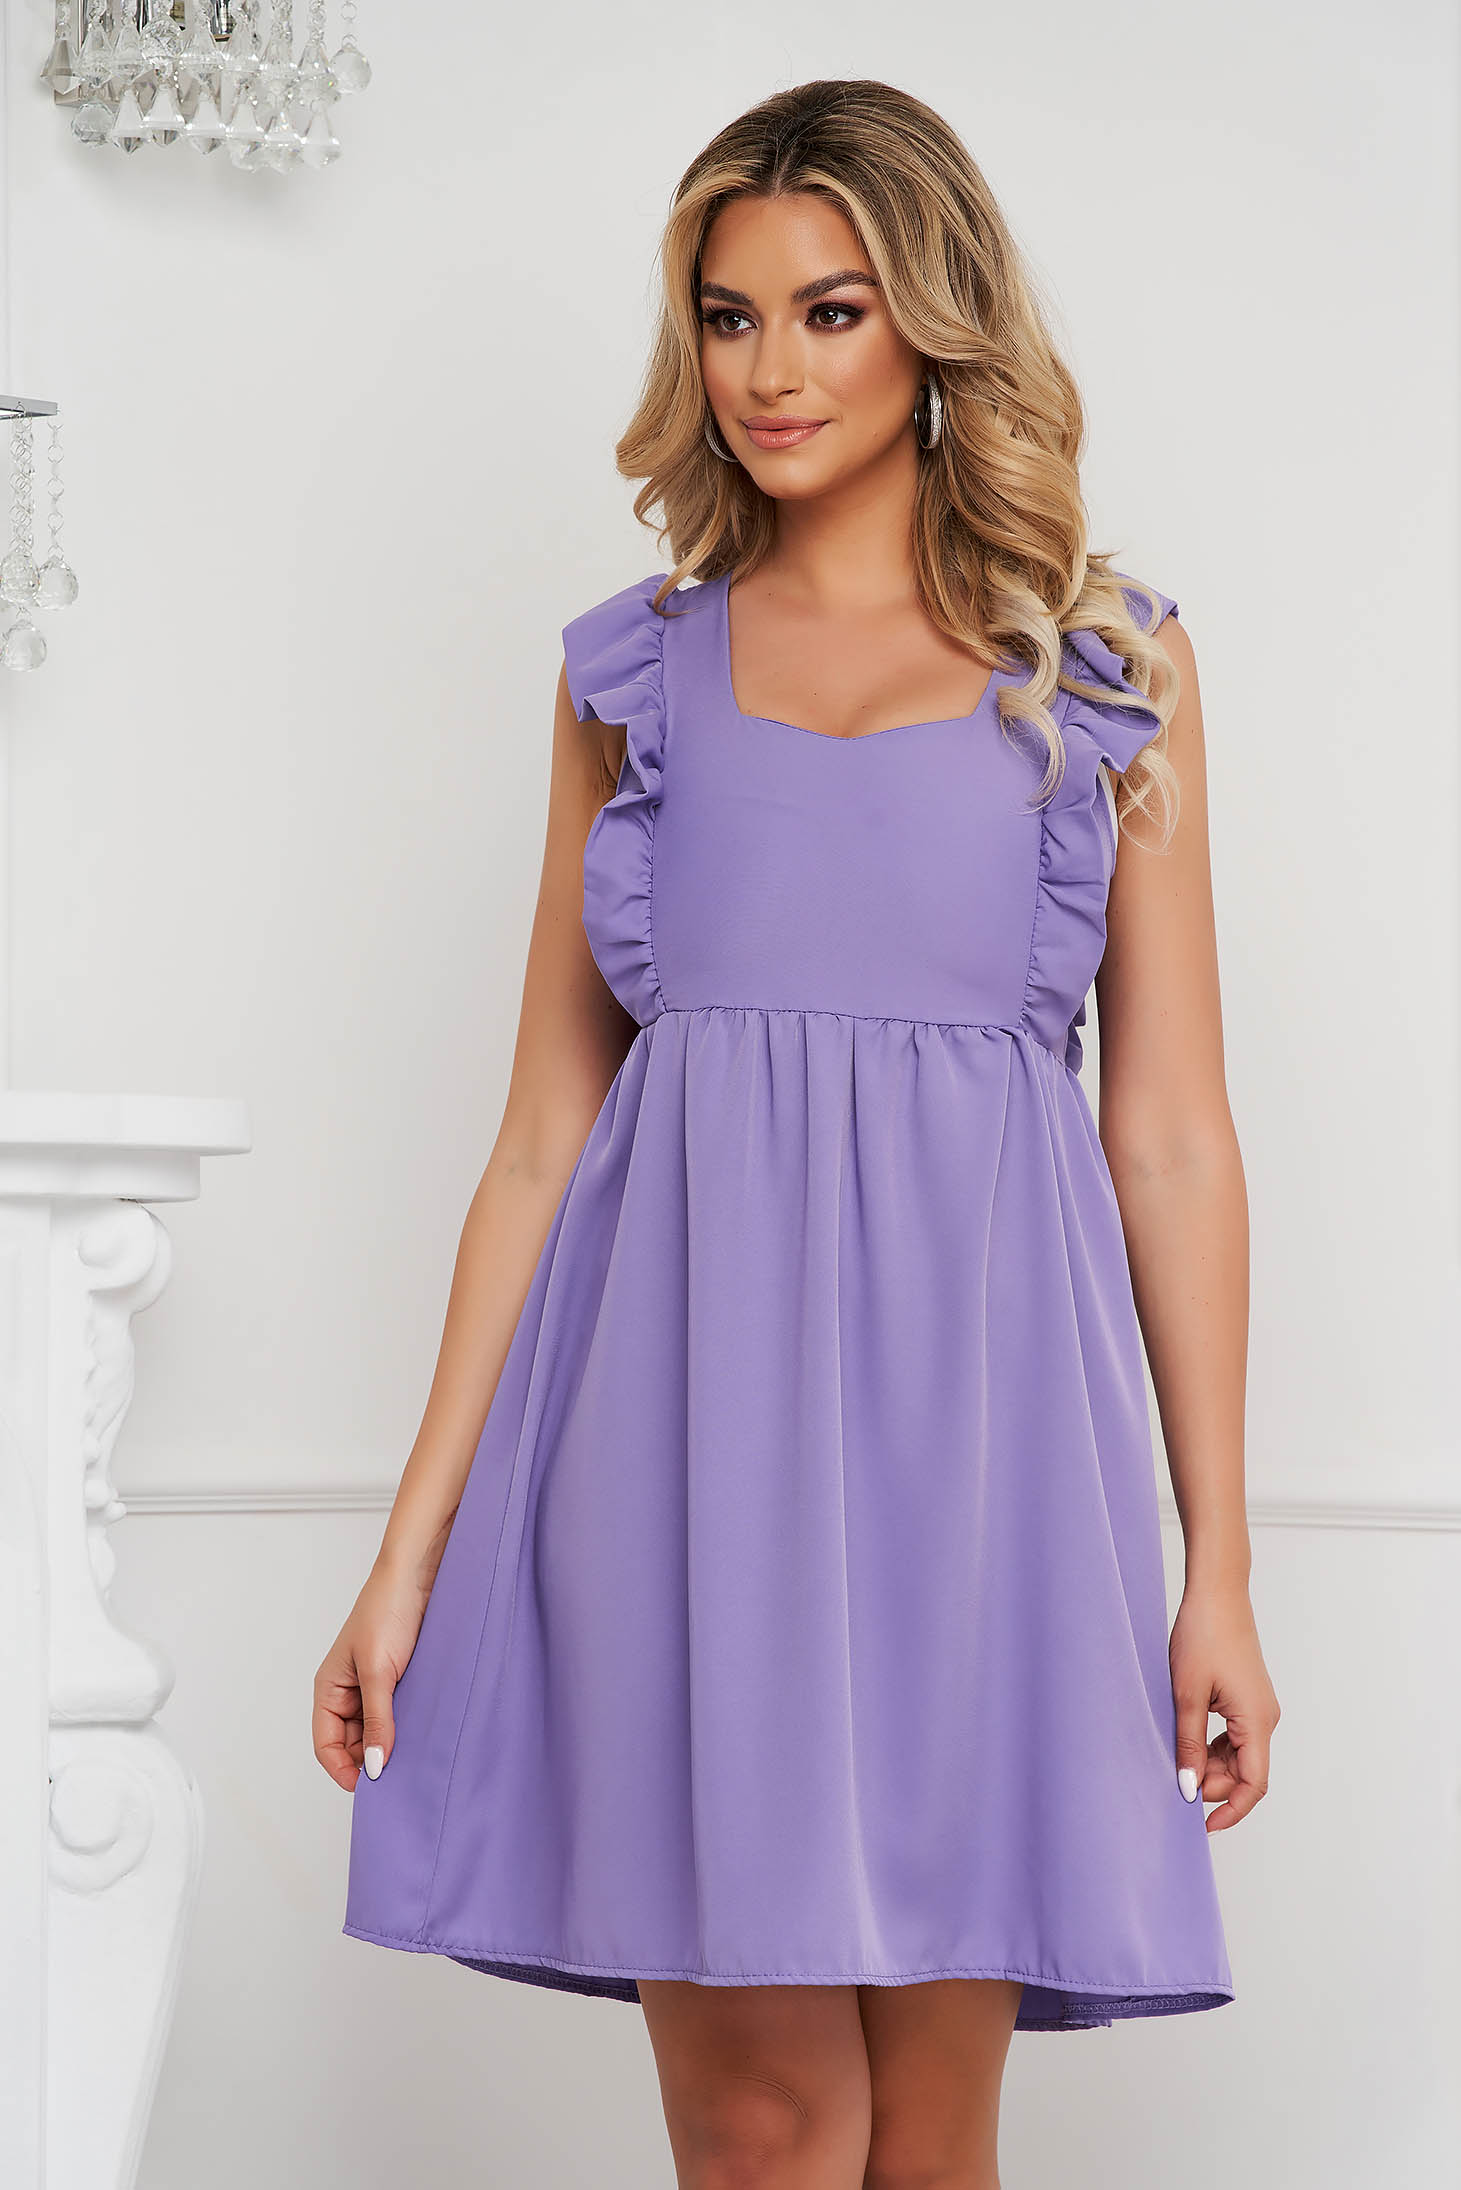 Lila dress a-line with ruffle details short cut